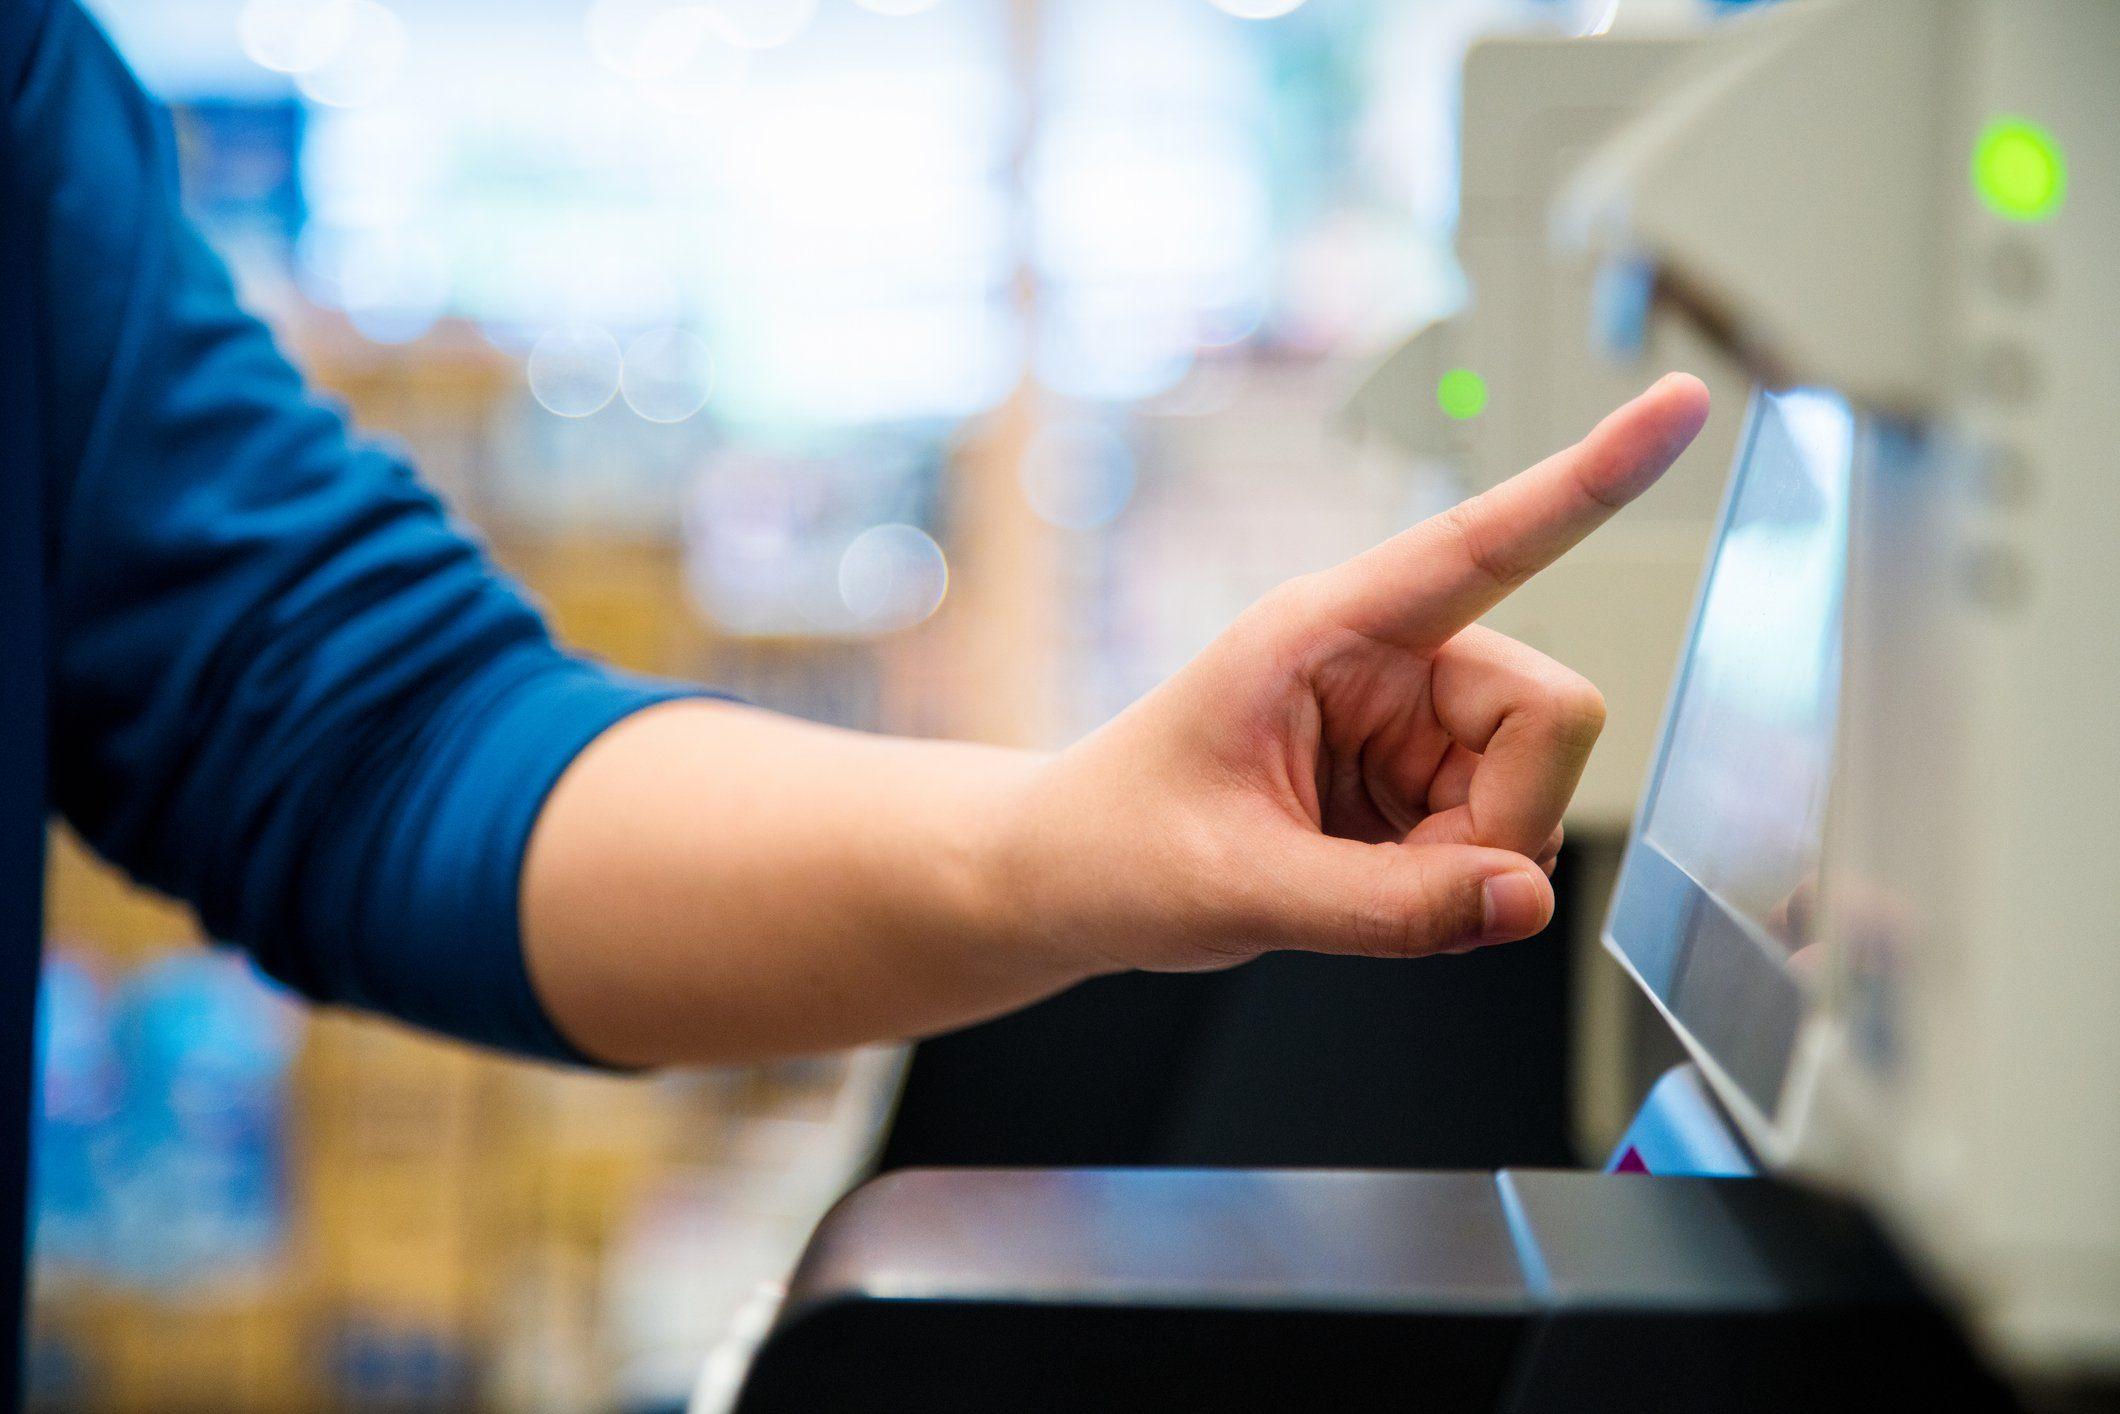 Close up of a woman using a self checkout machine